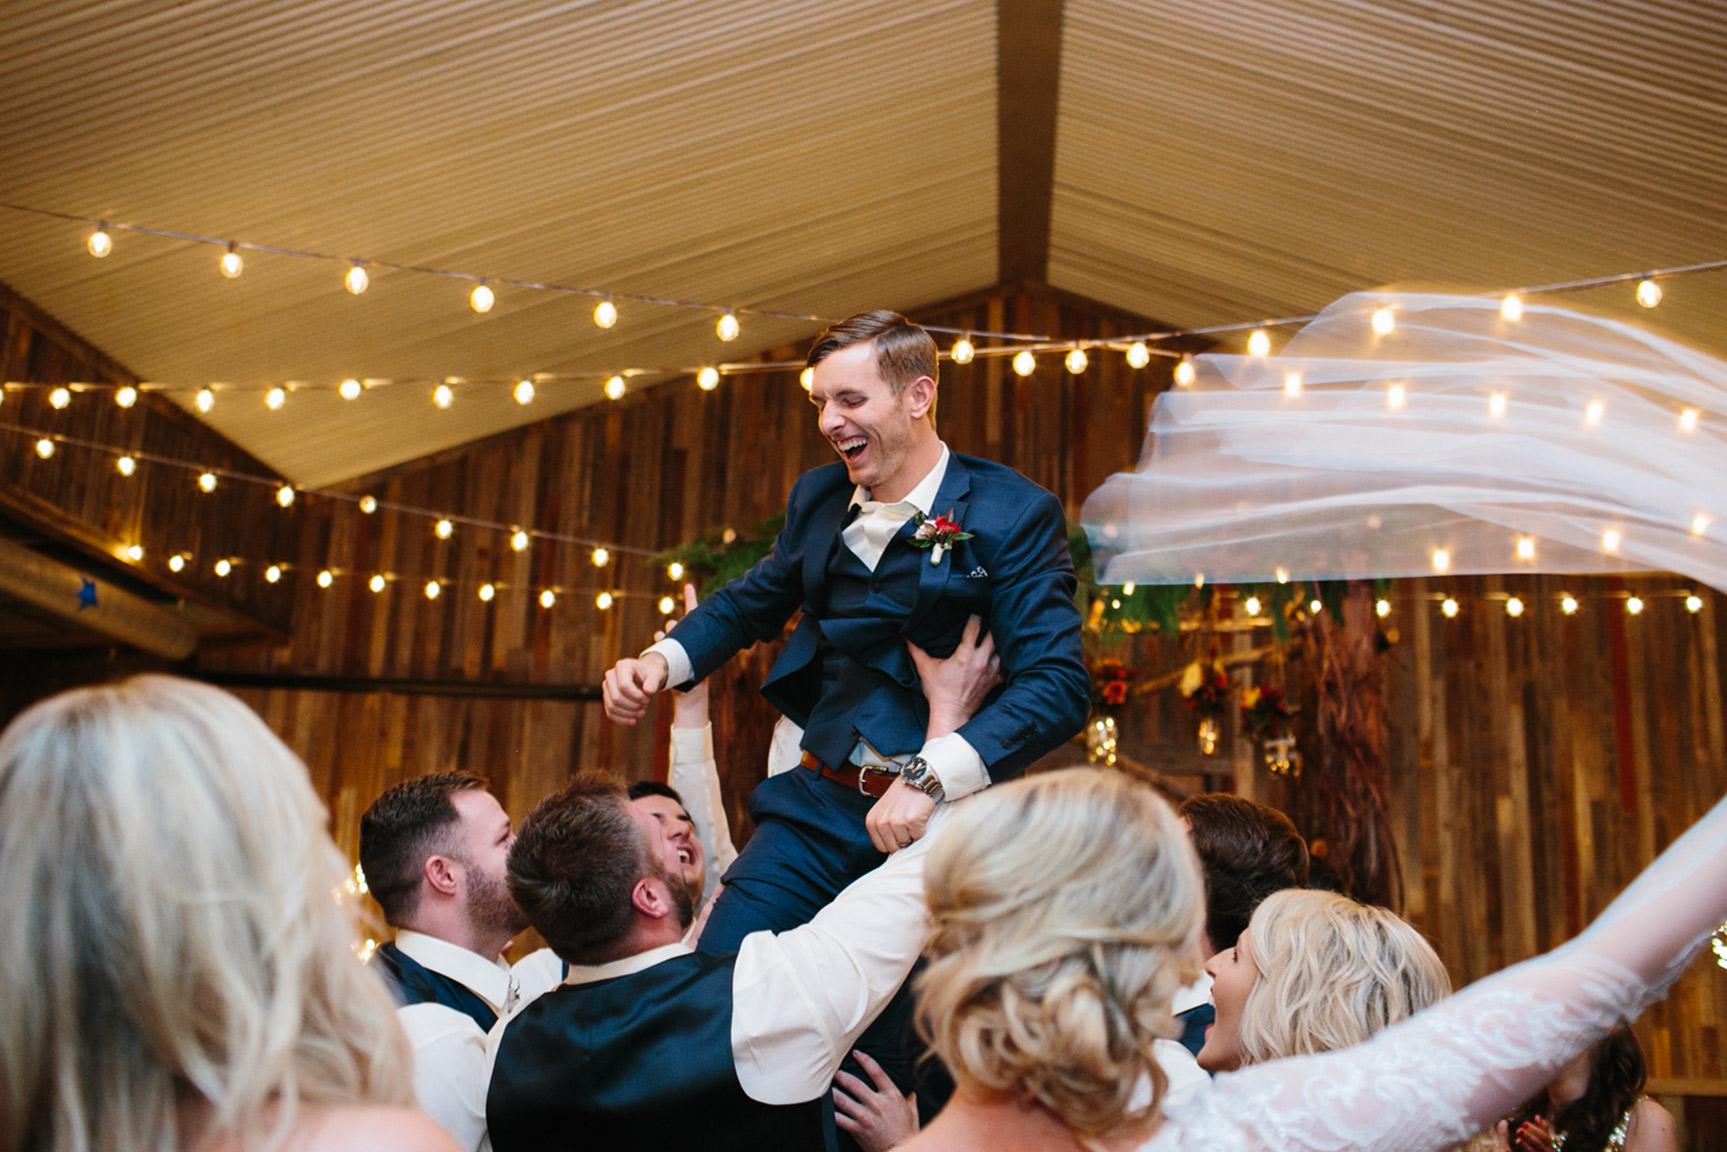 Cotton_Creek_Barn_Winter_Wedding_WeddingPhotographer057.jpg